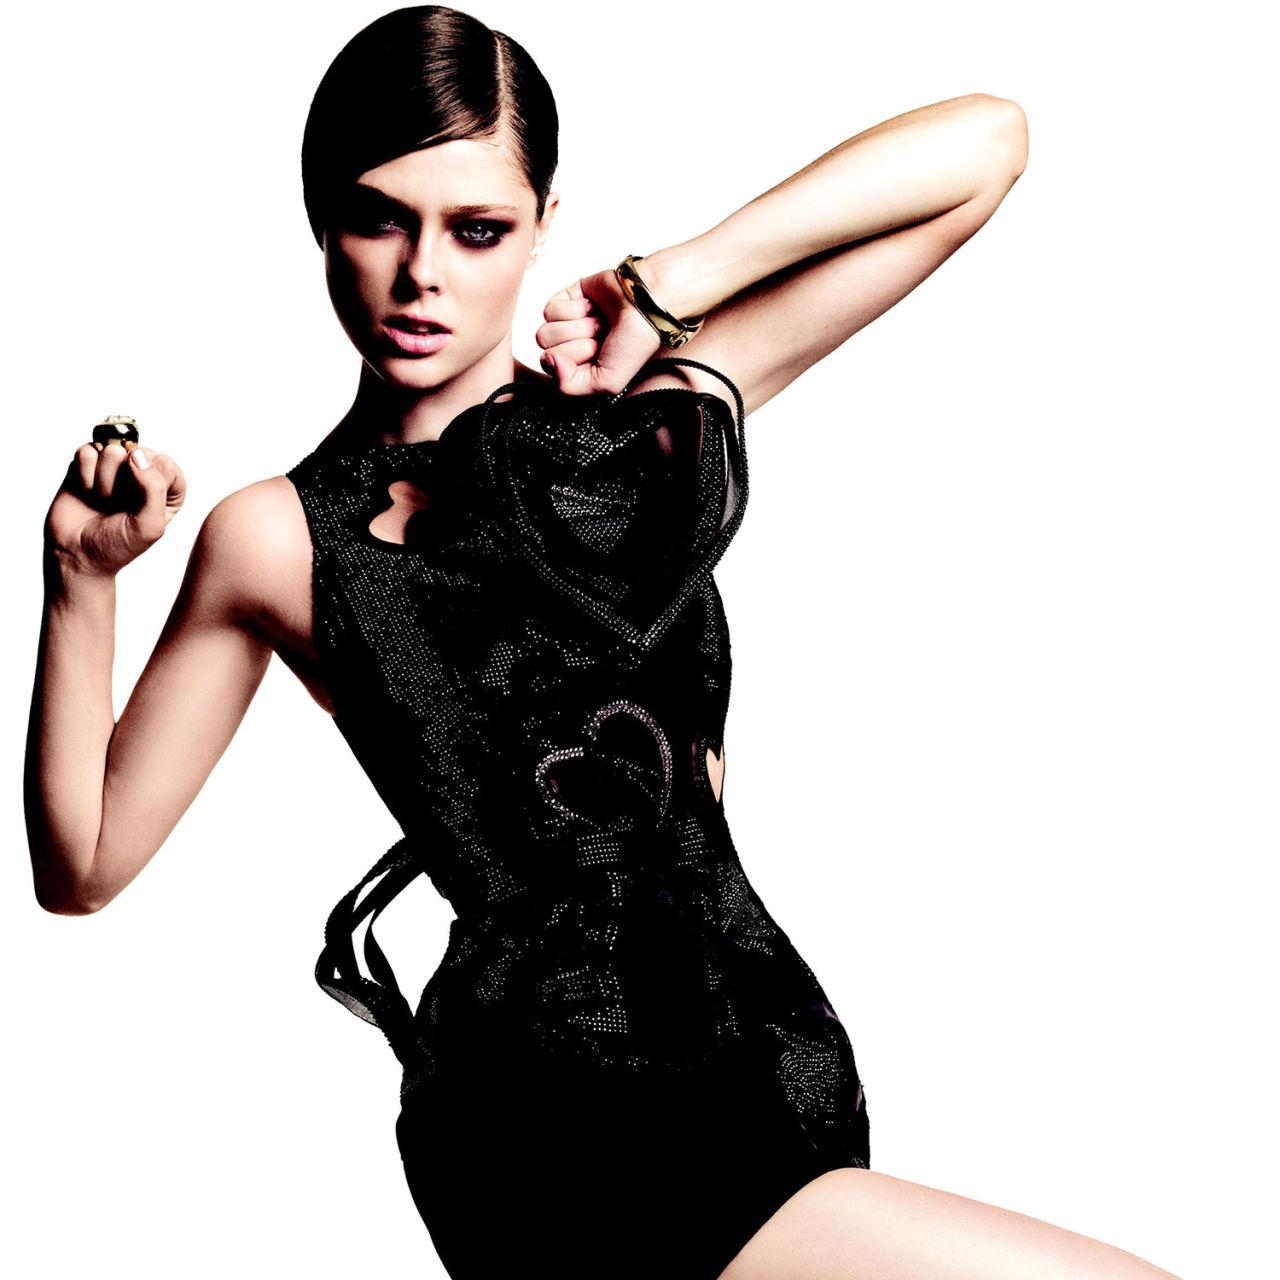 Fitness 101 - Magazine cover